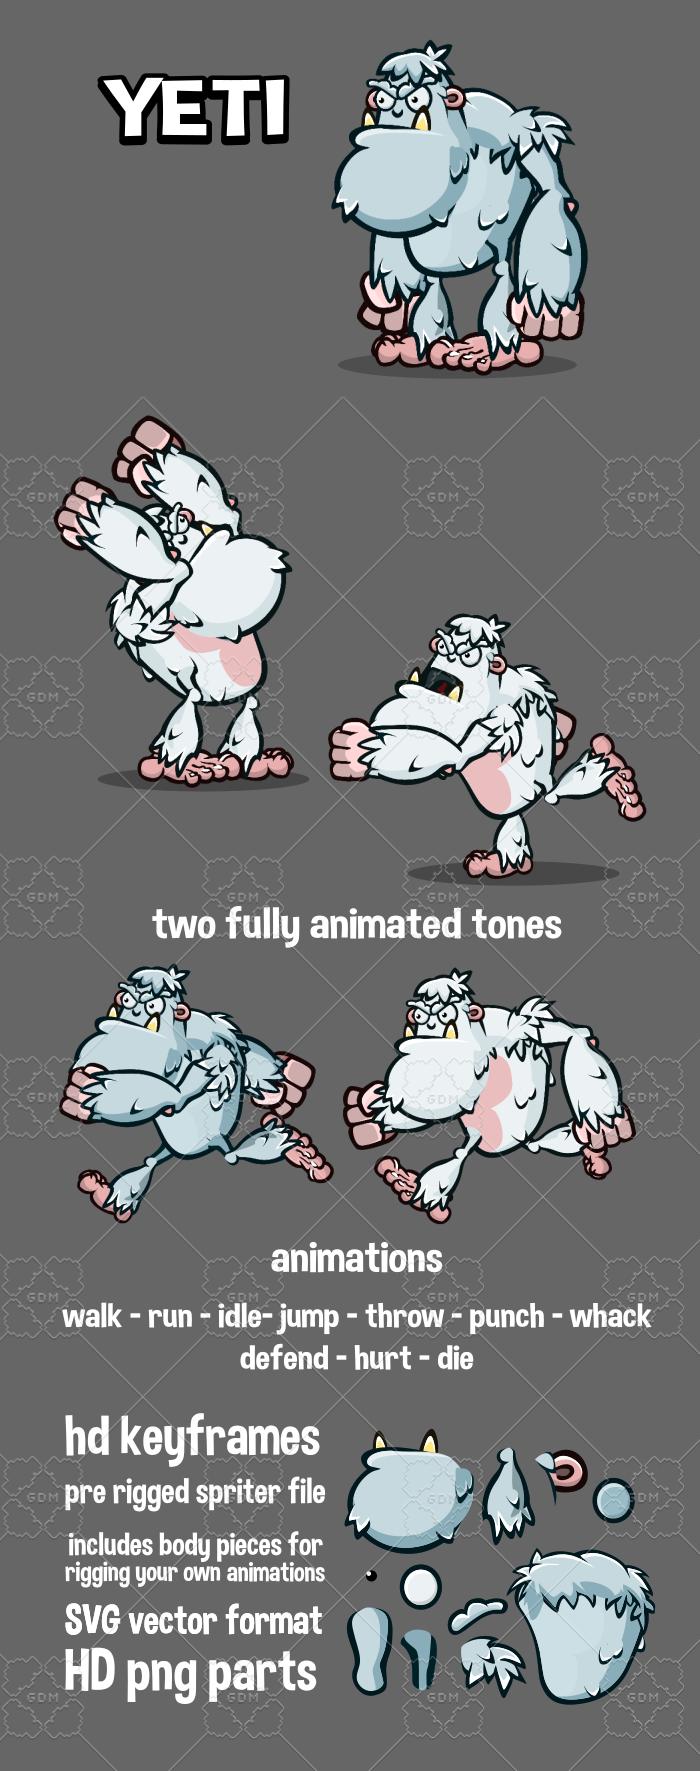 2d animated yeti game asset